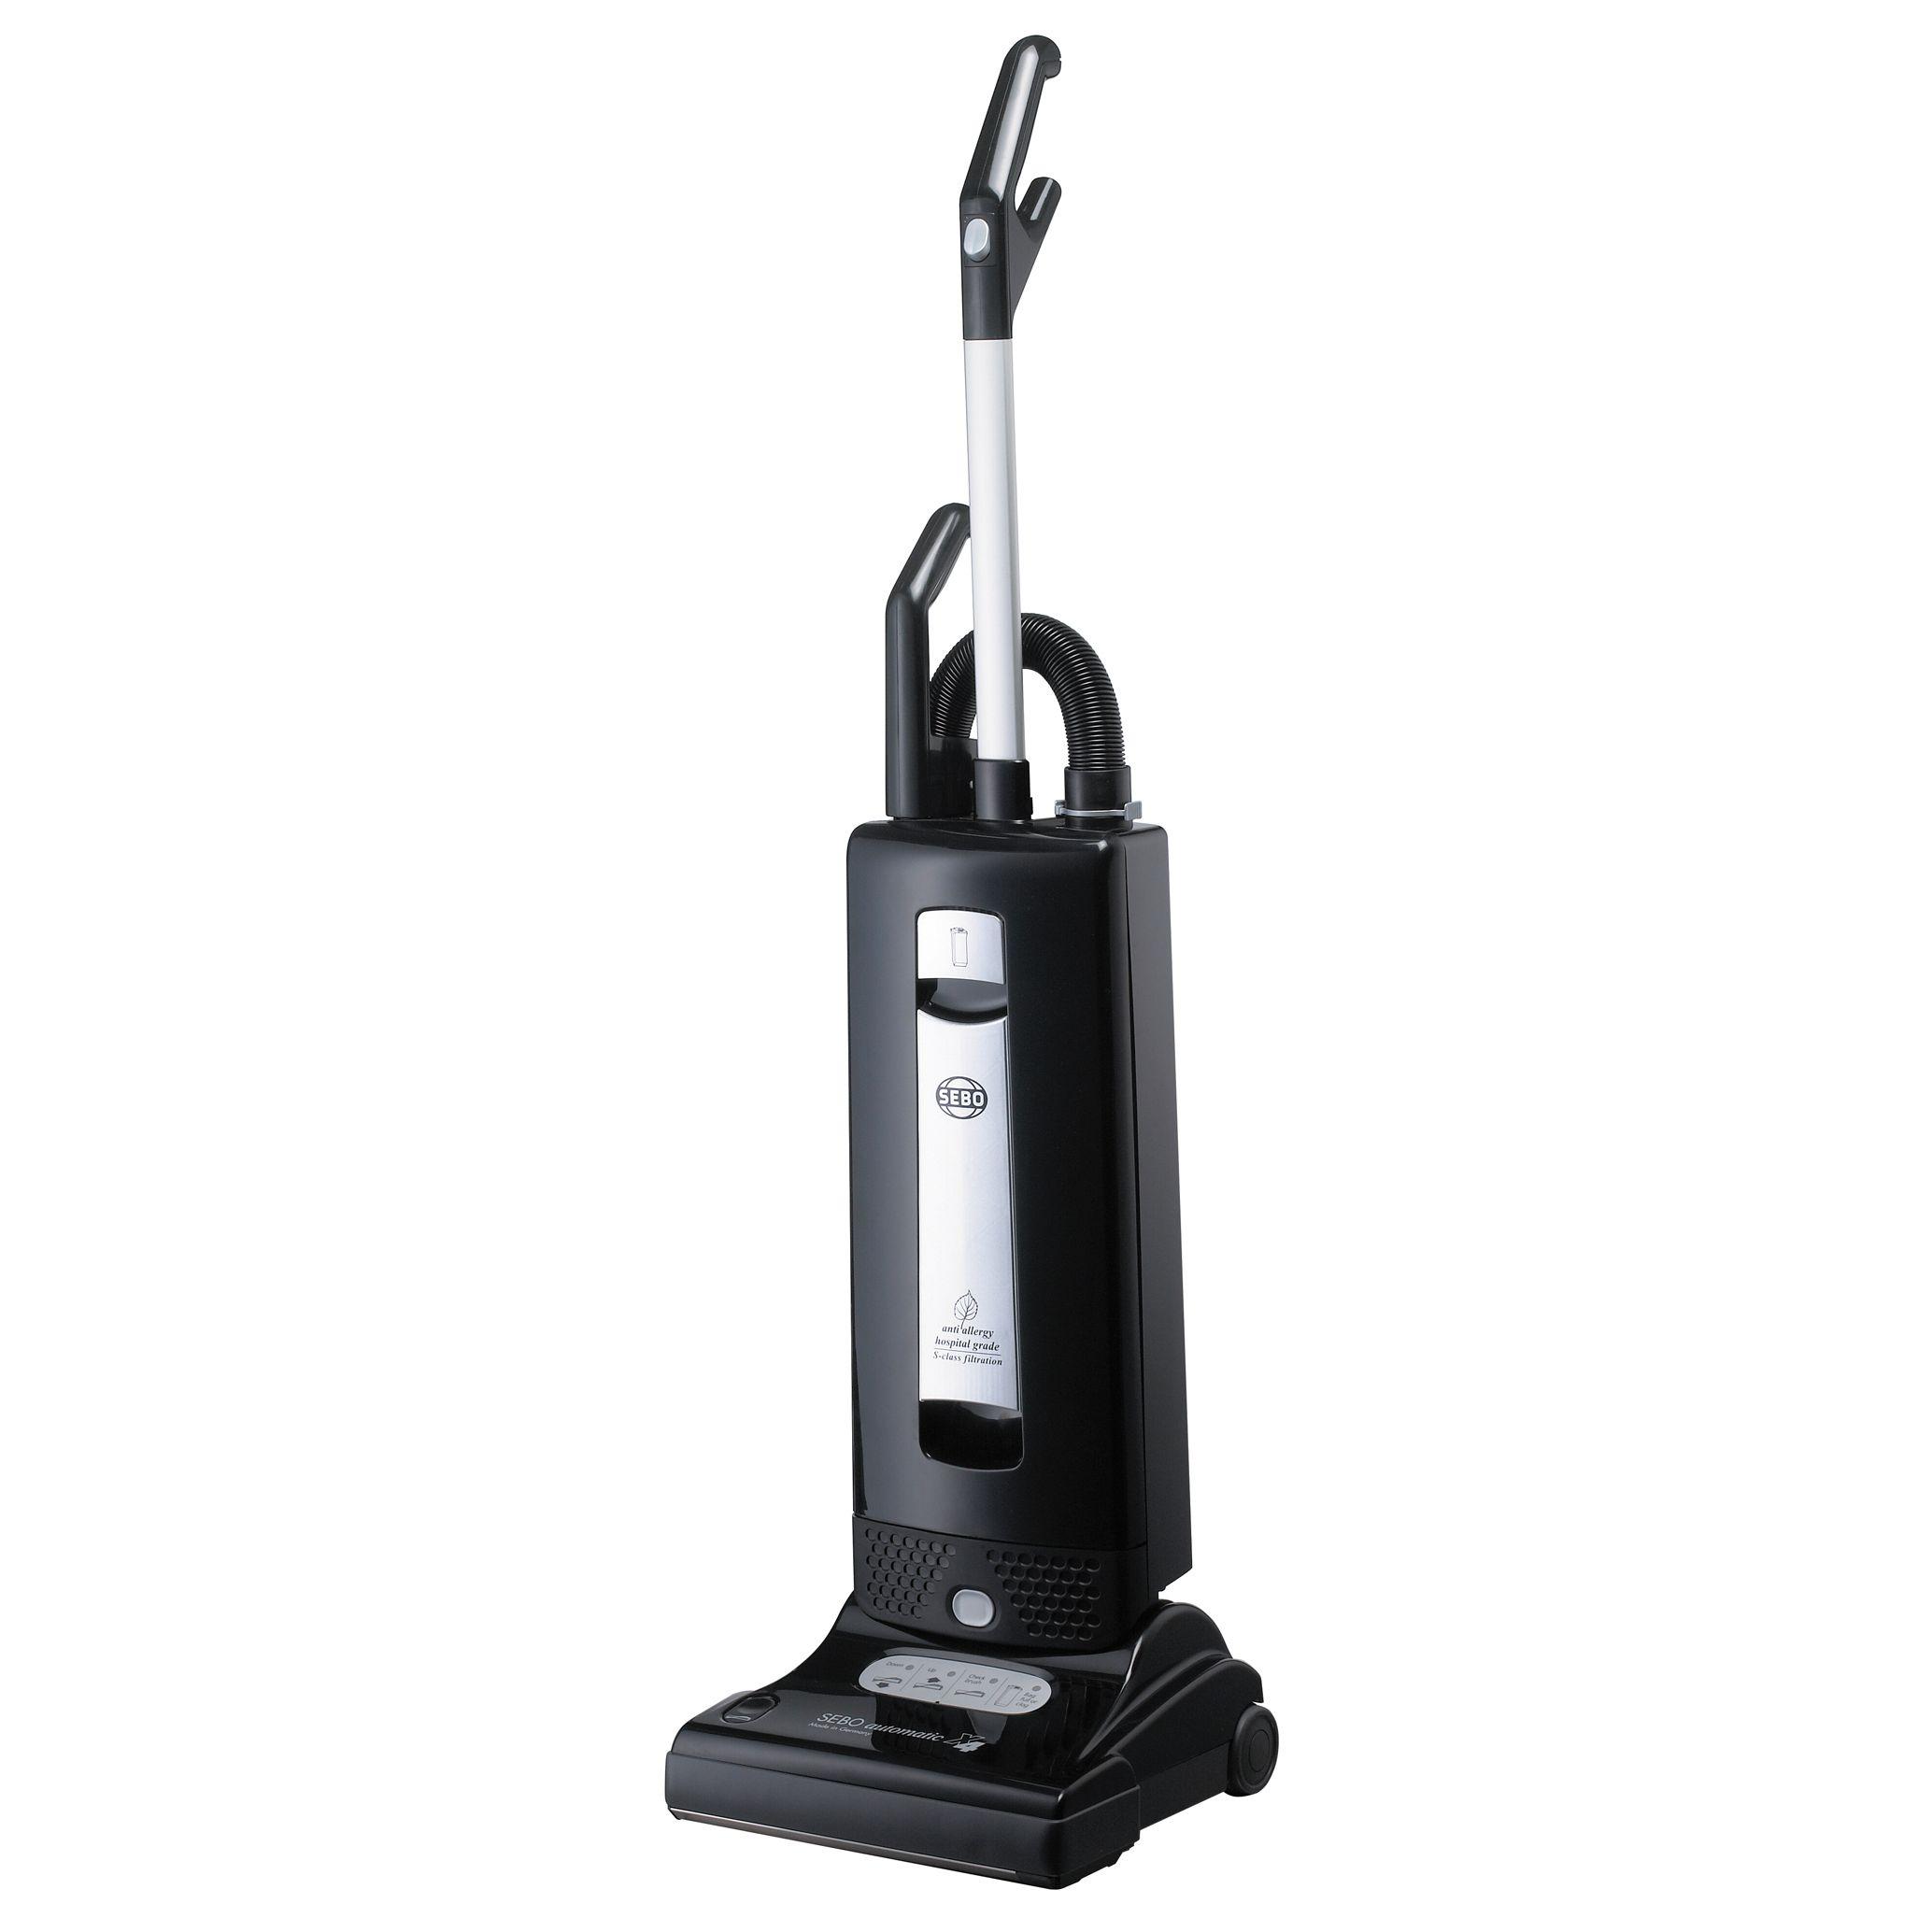 Sebo X4 Pet Upright Vacuum Cleaner